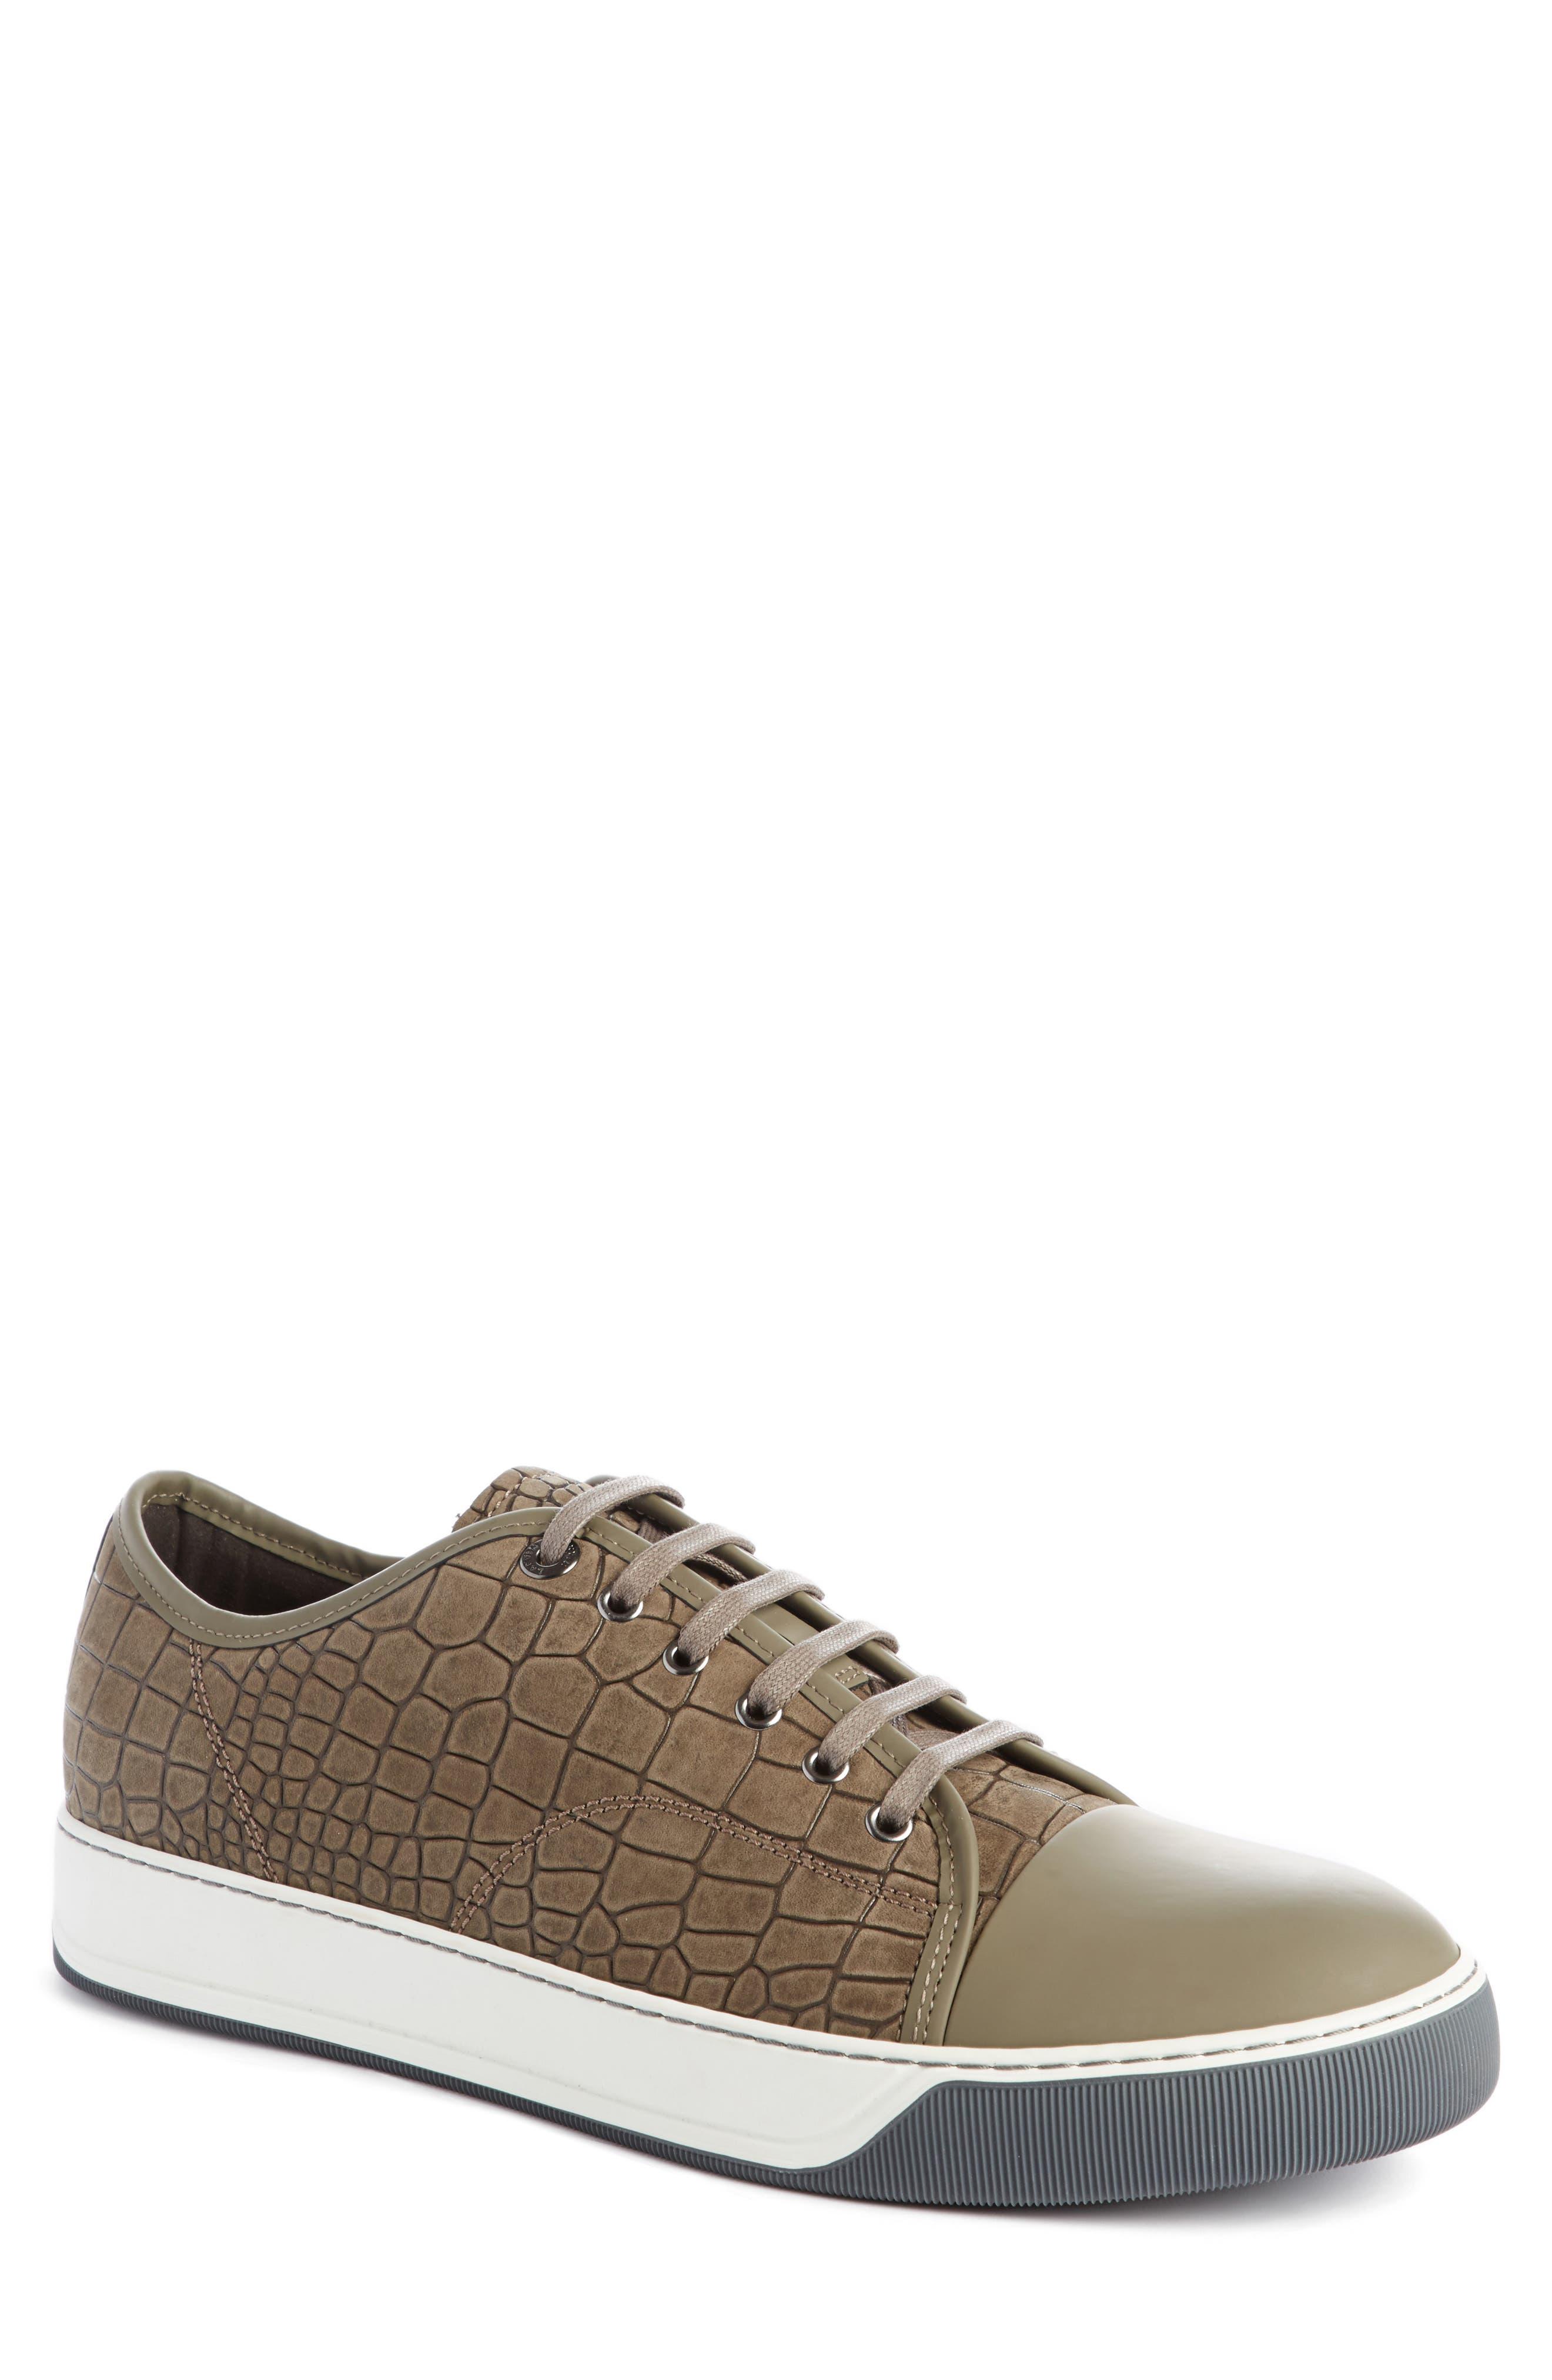 Lanvin Embossed Nubuck Low Top Sneaker (Men)